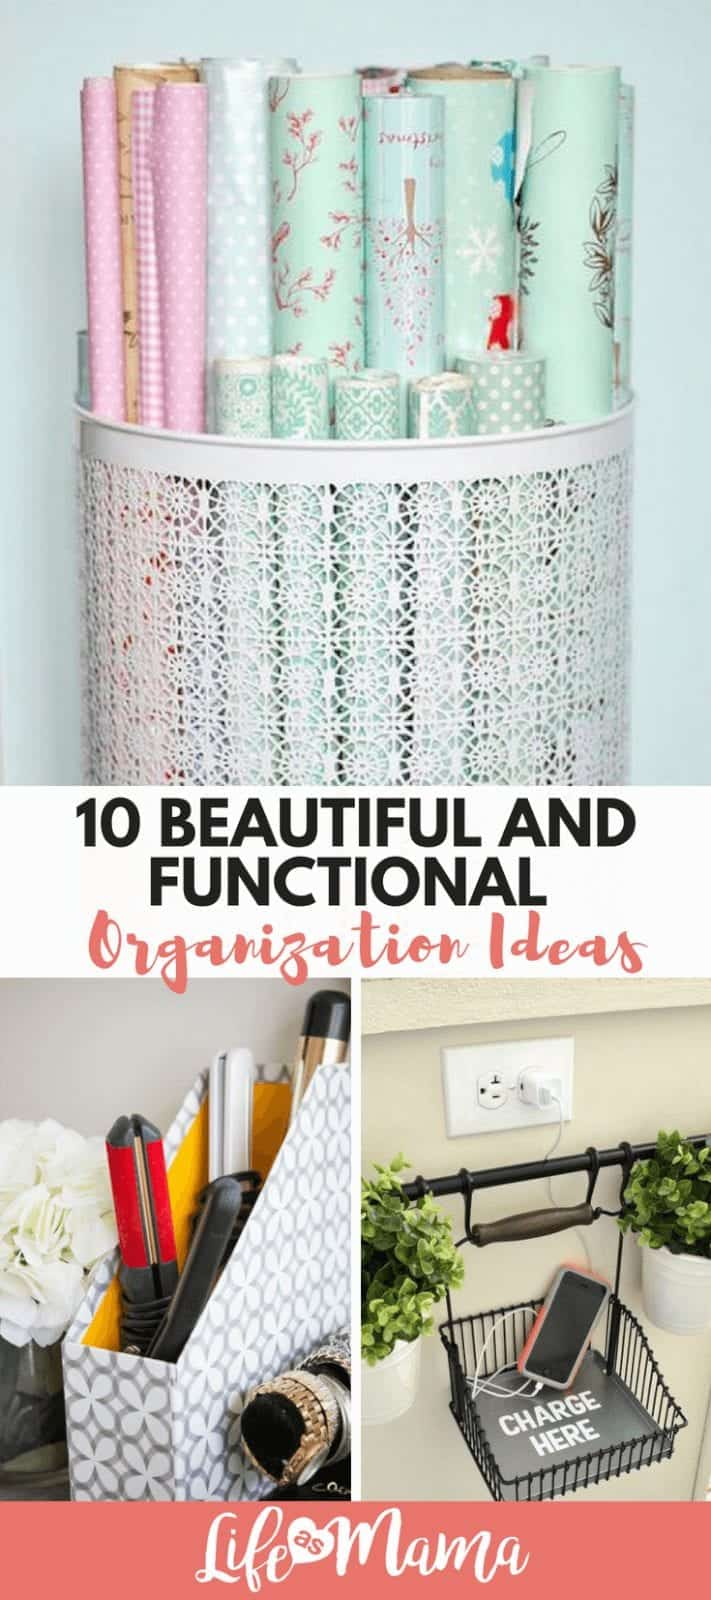 10 Beautiful And Functional Organization Ideas